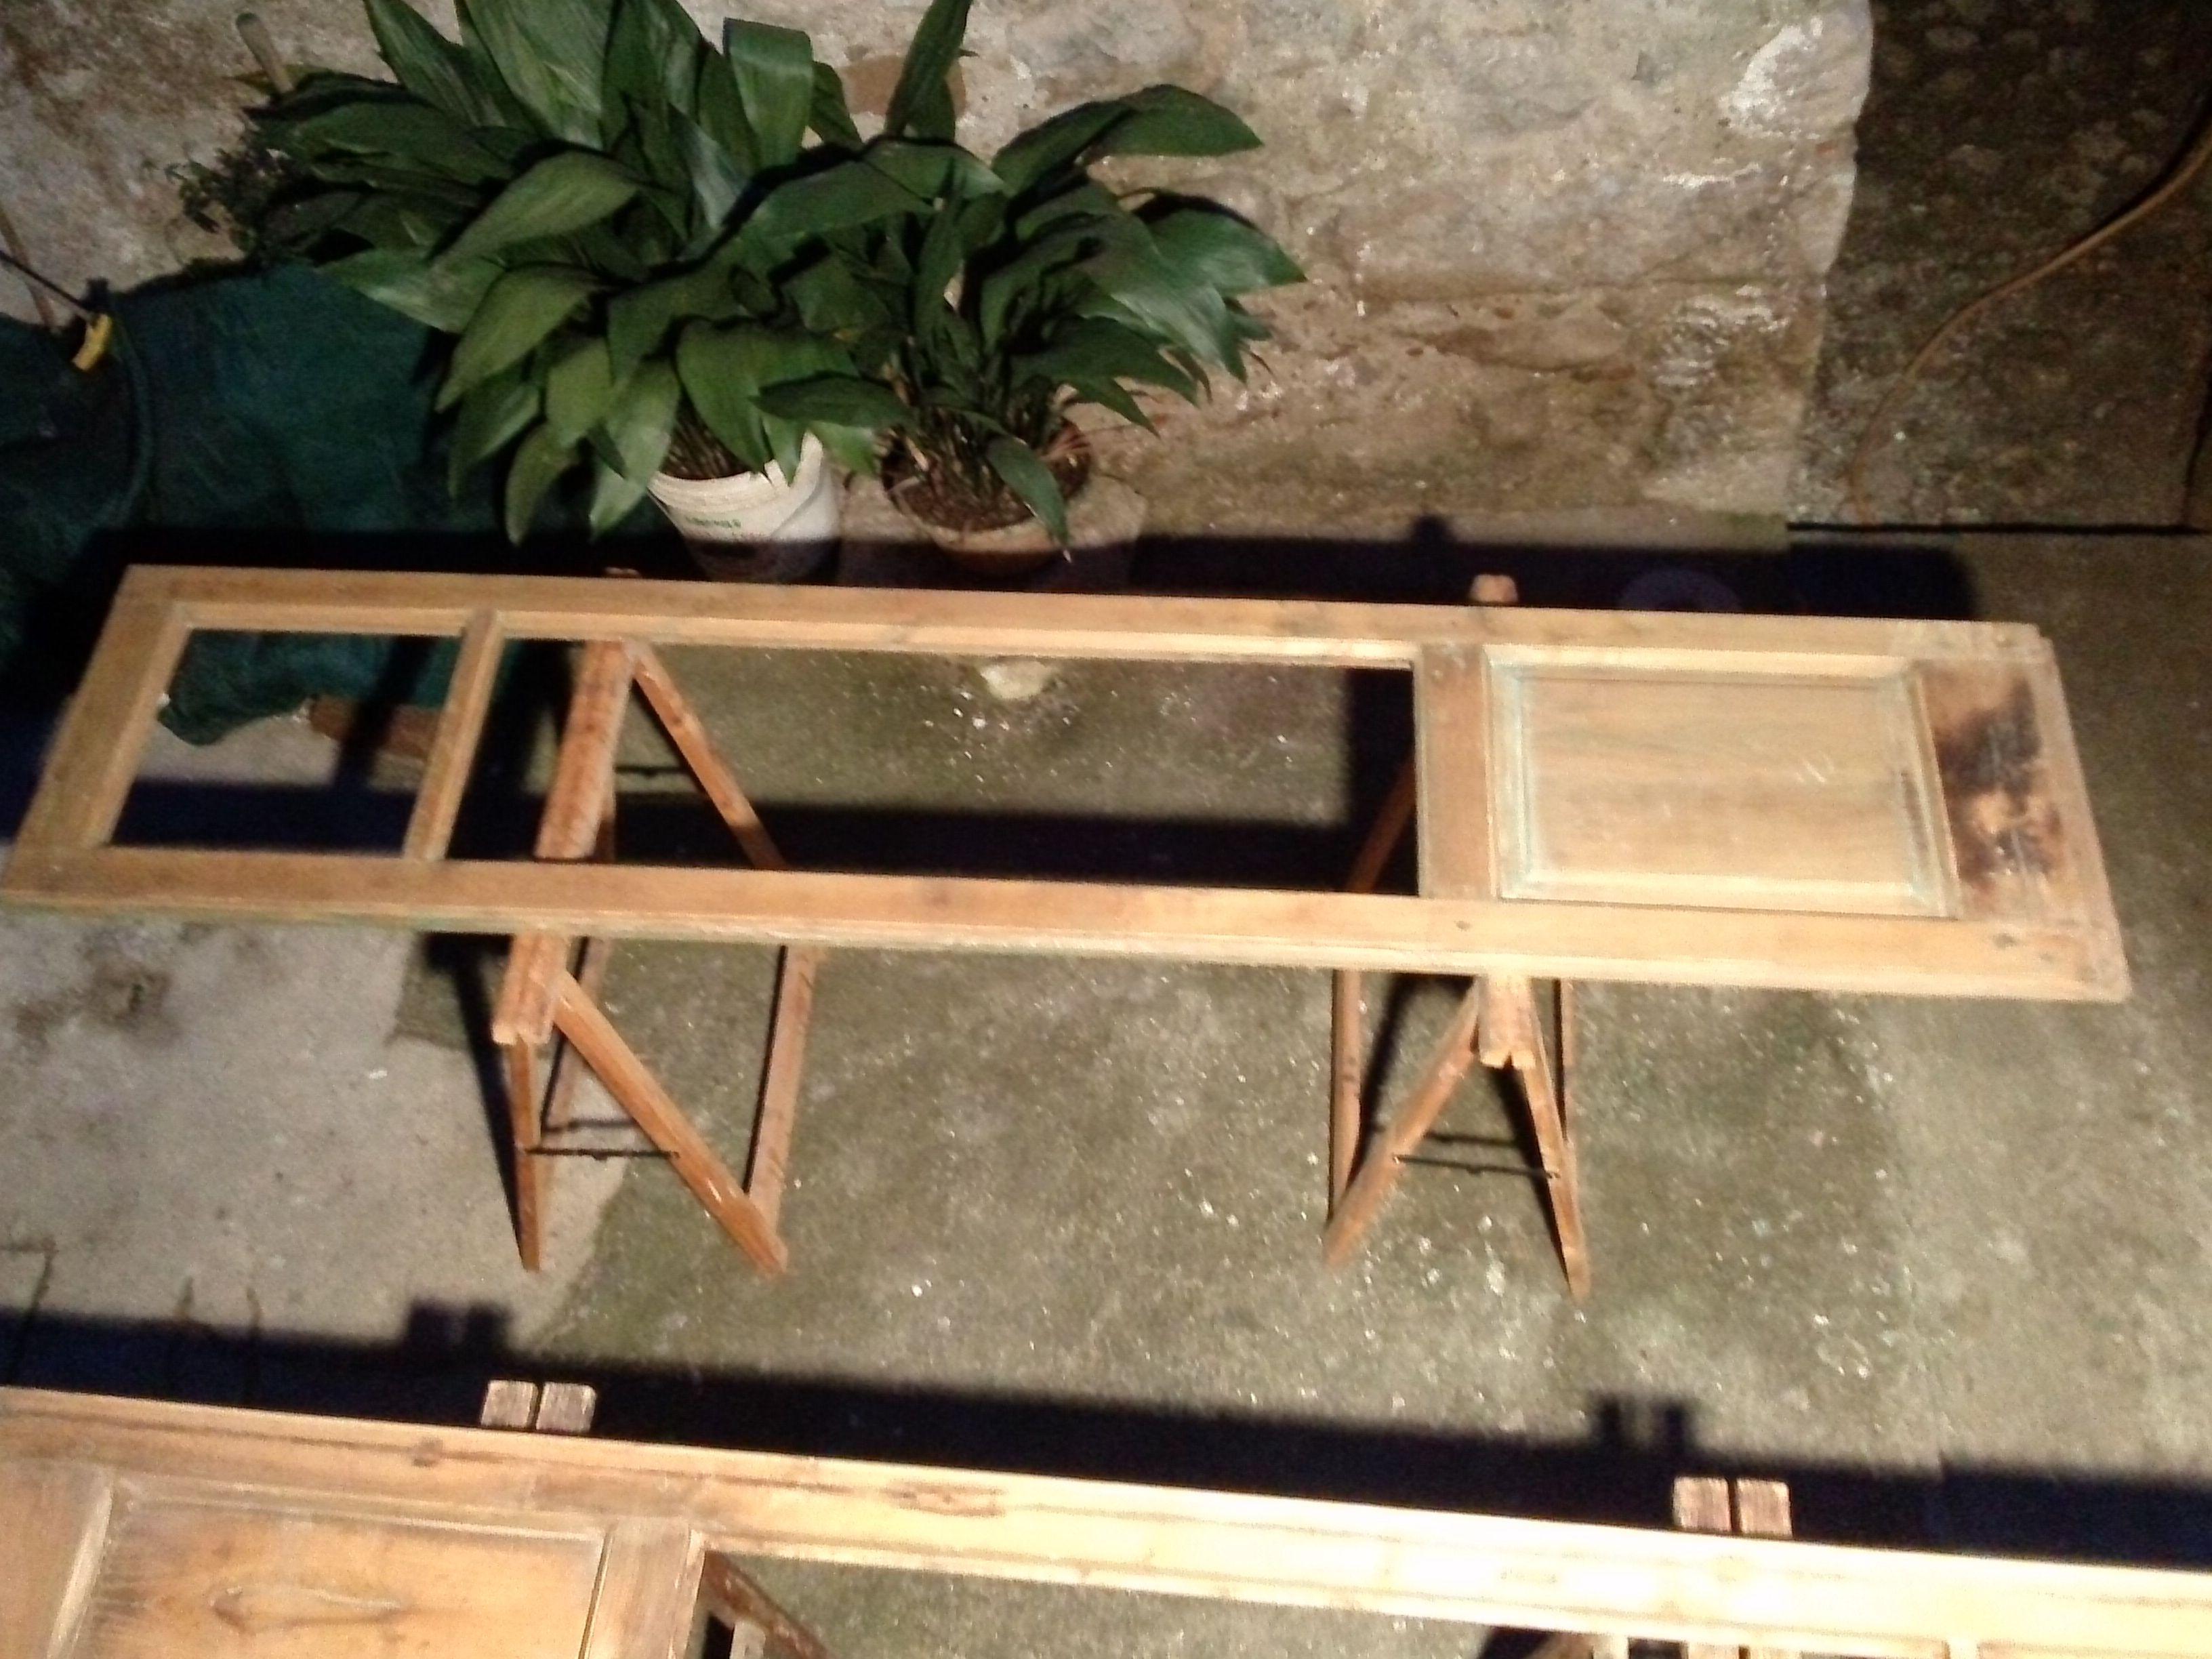 Ristrutturazione di una serie di infissi in legno di castagno how made restoration furniture - Ristrutturazione mobili legno ...